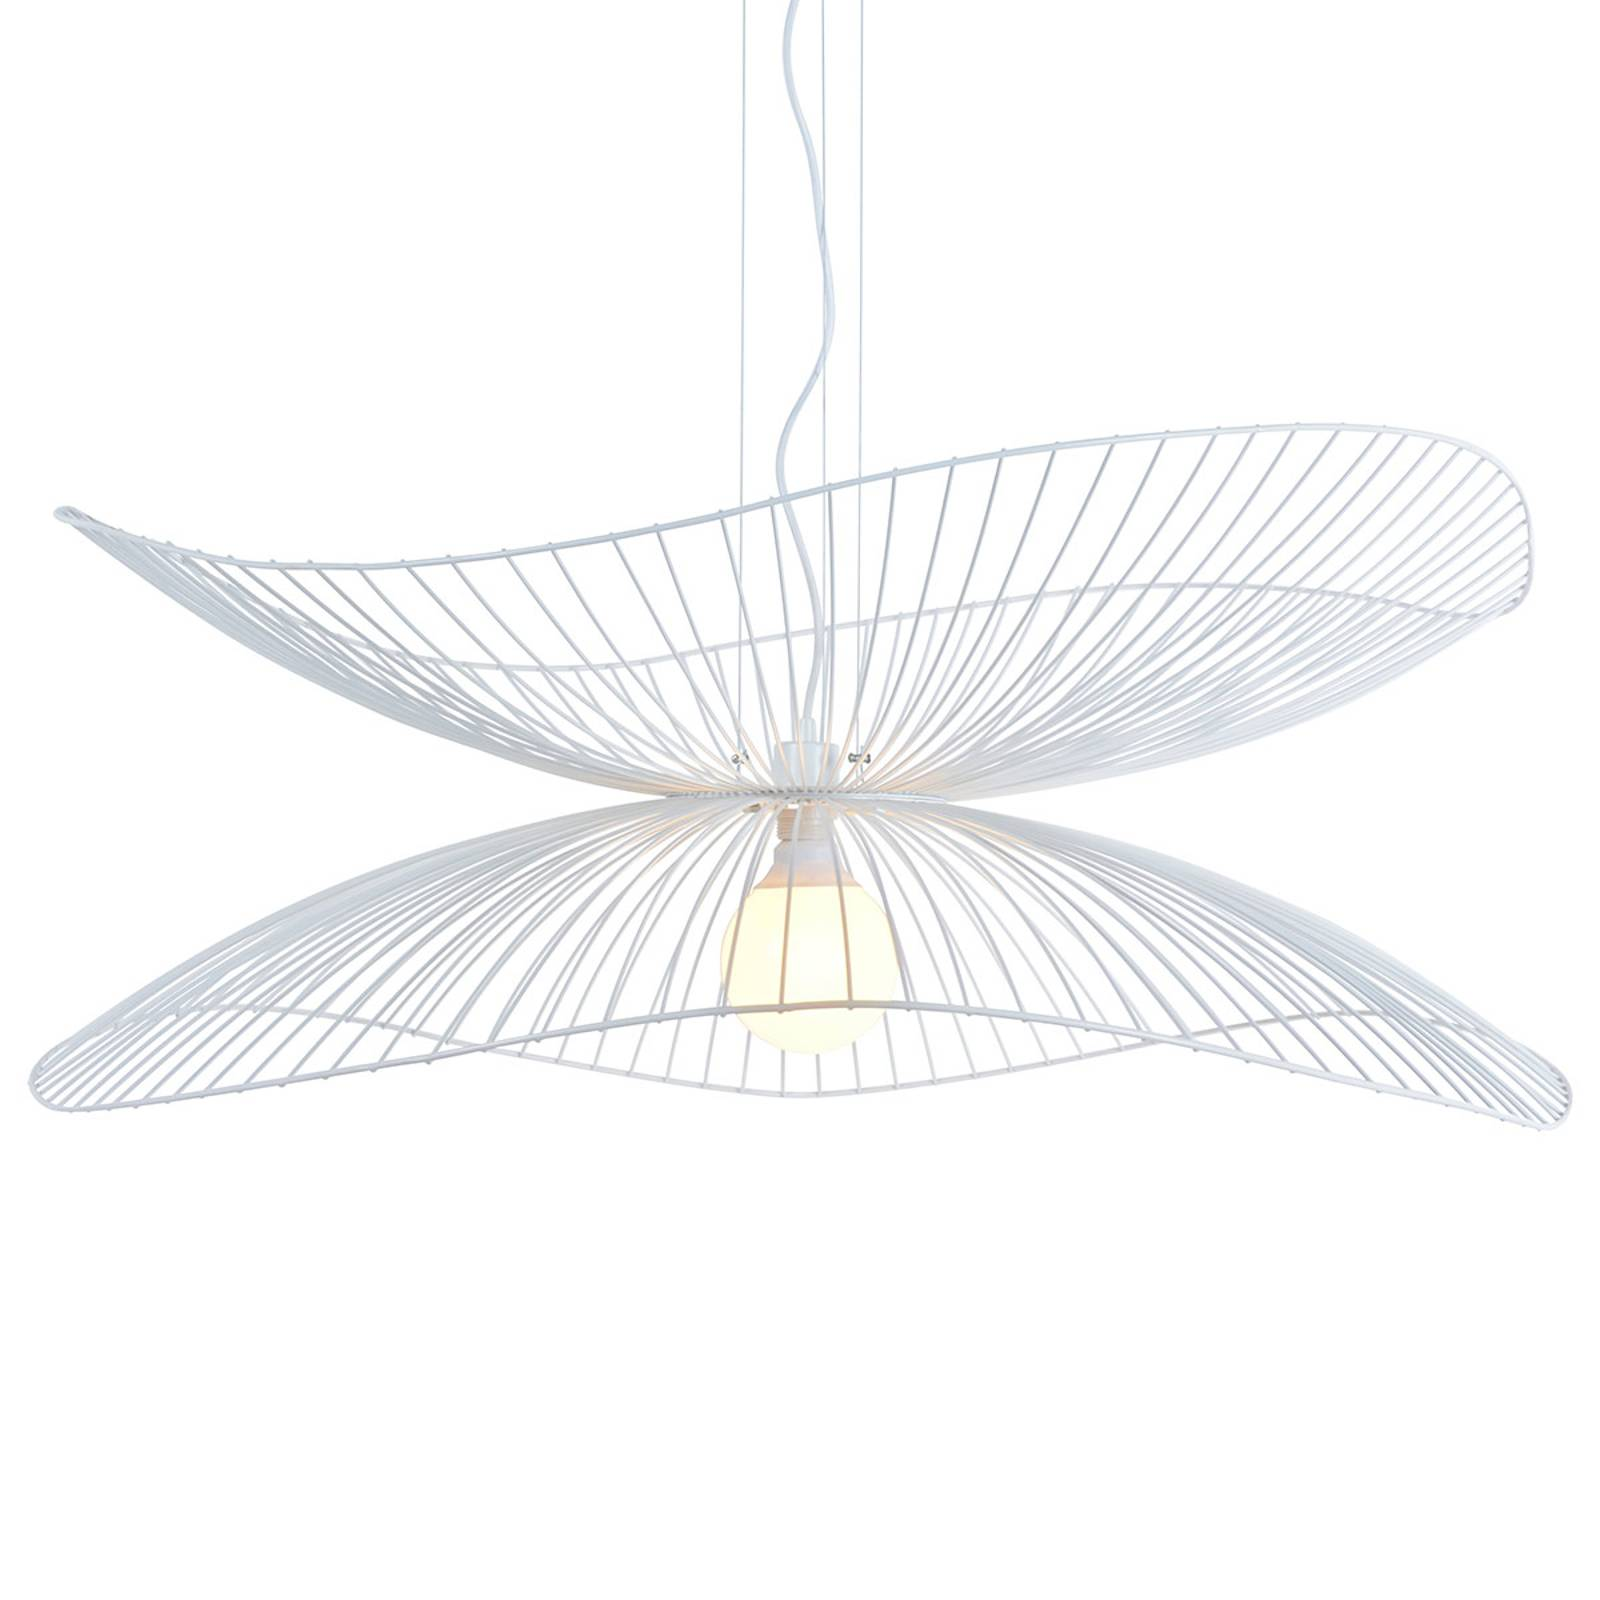 Forestier Libellule L hanglamp, 100 cm, wit